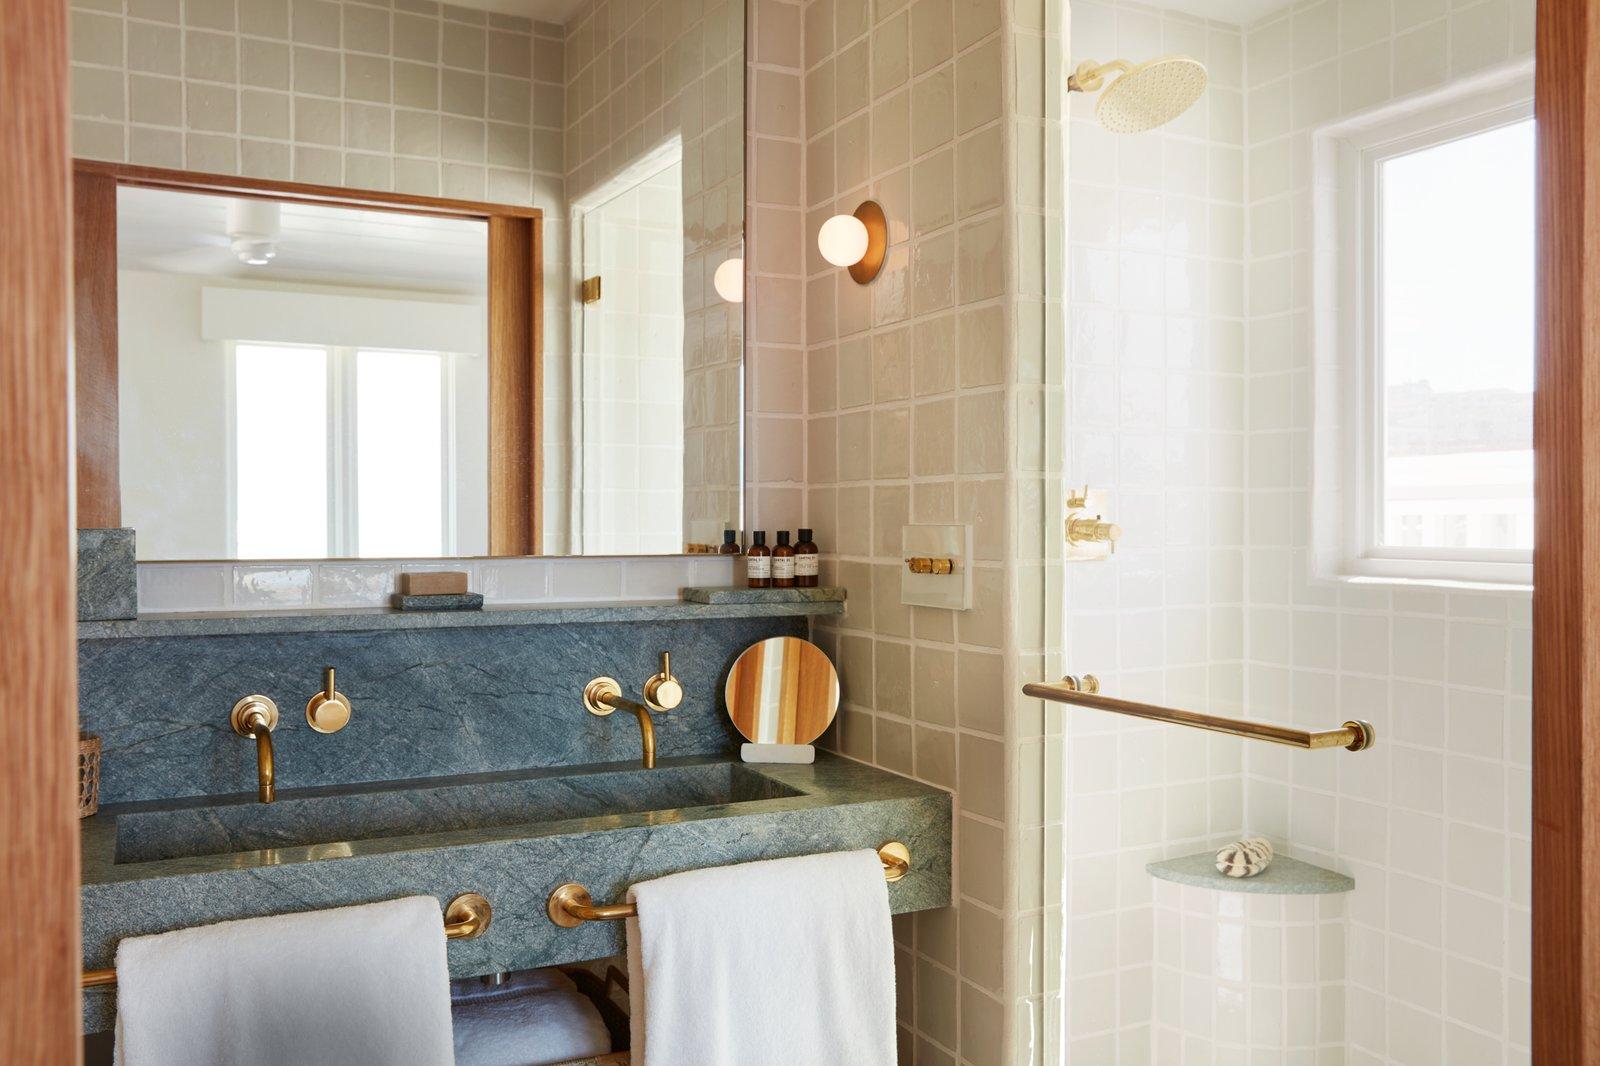 Hotel Joaquin stone vanity bathroom